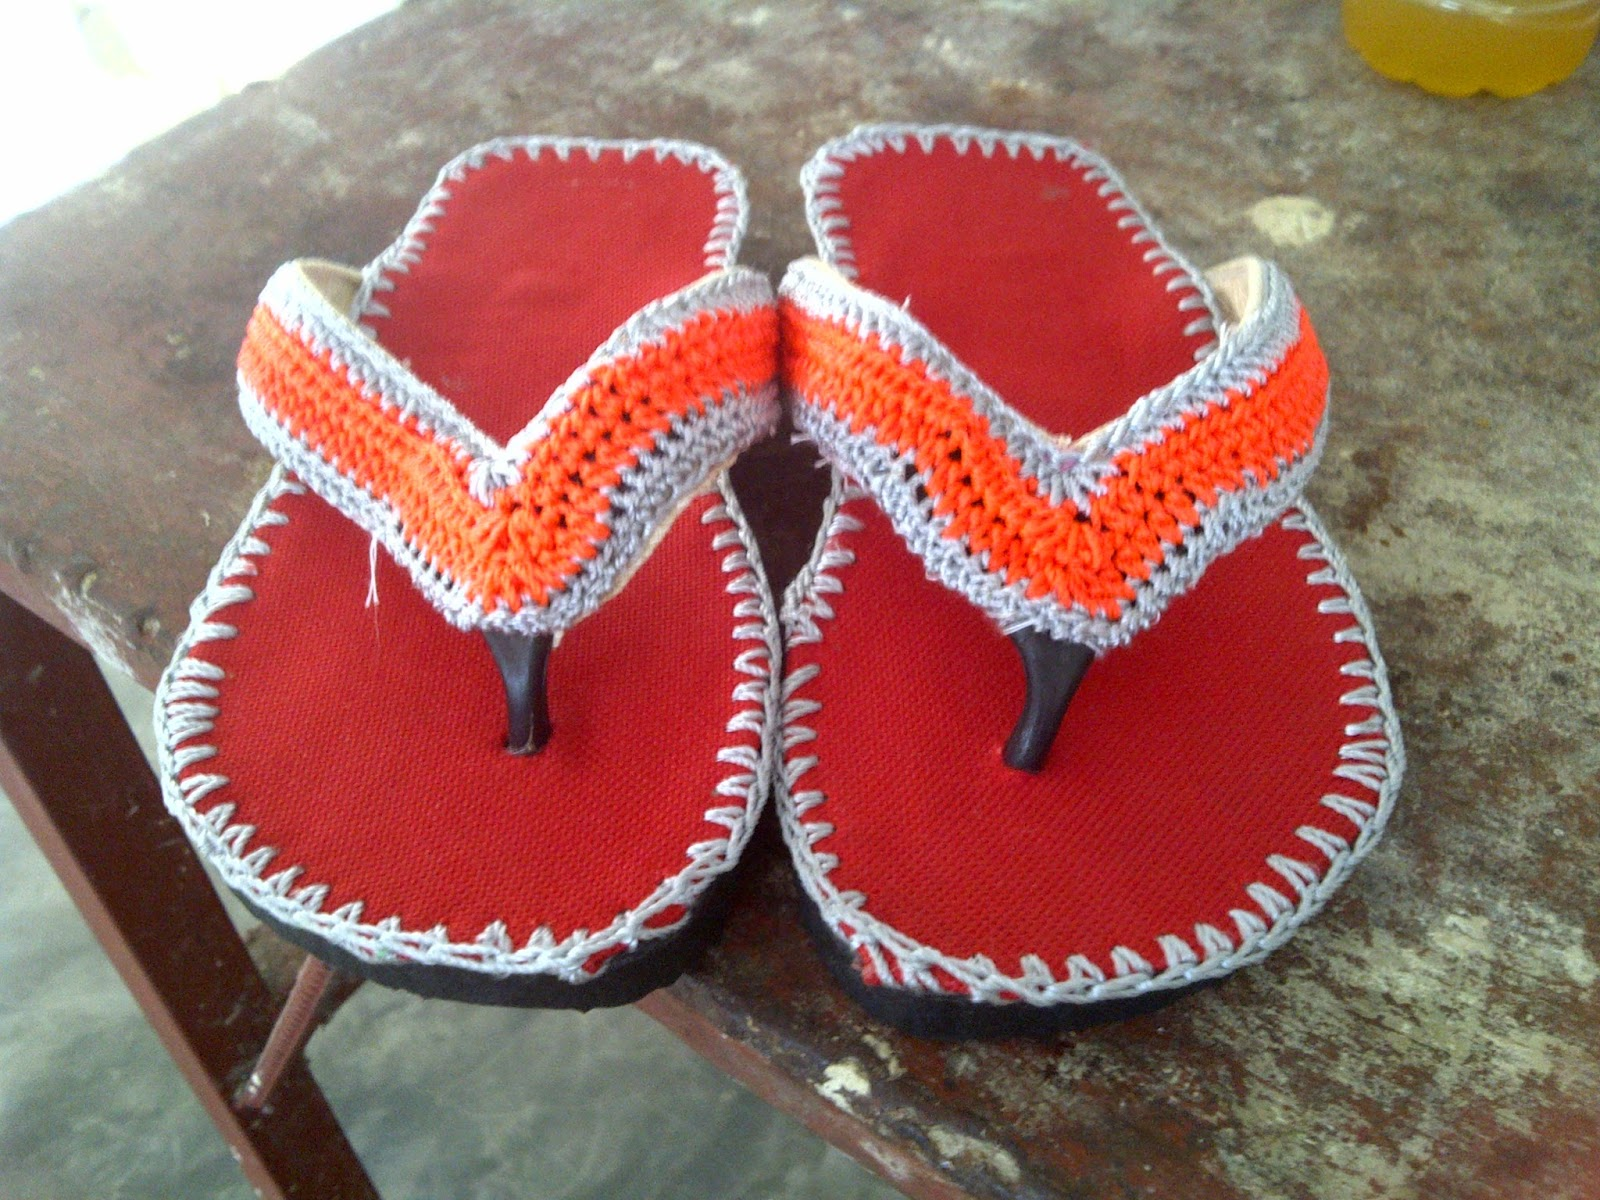 Ana luisa y sus tejidos zapatos y sandalias tejidos - Zapatos camarera antideslizantes ...